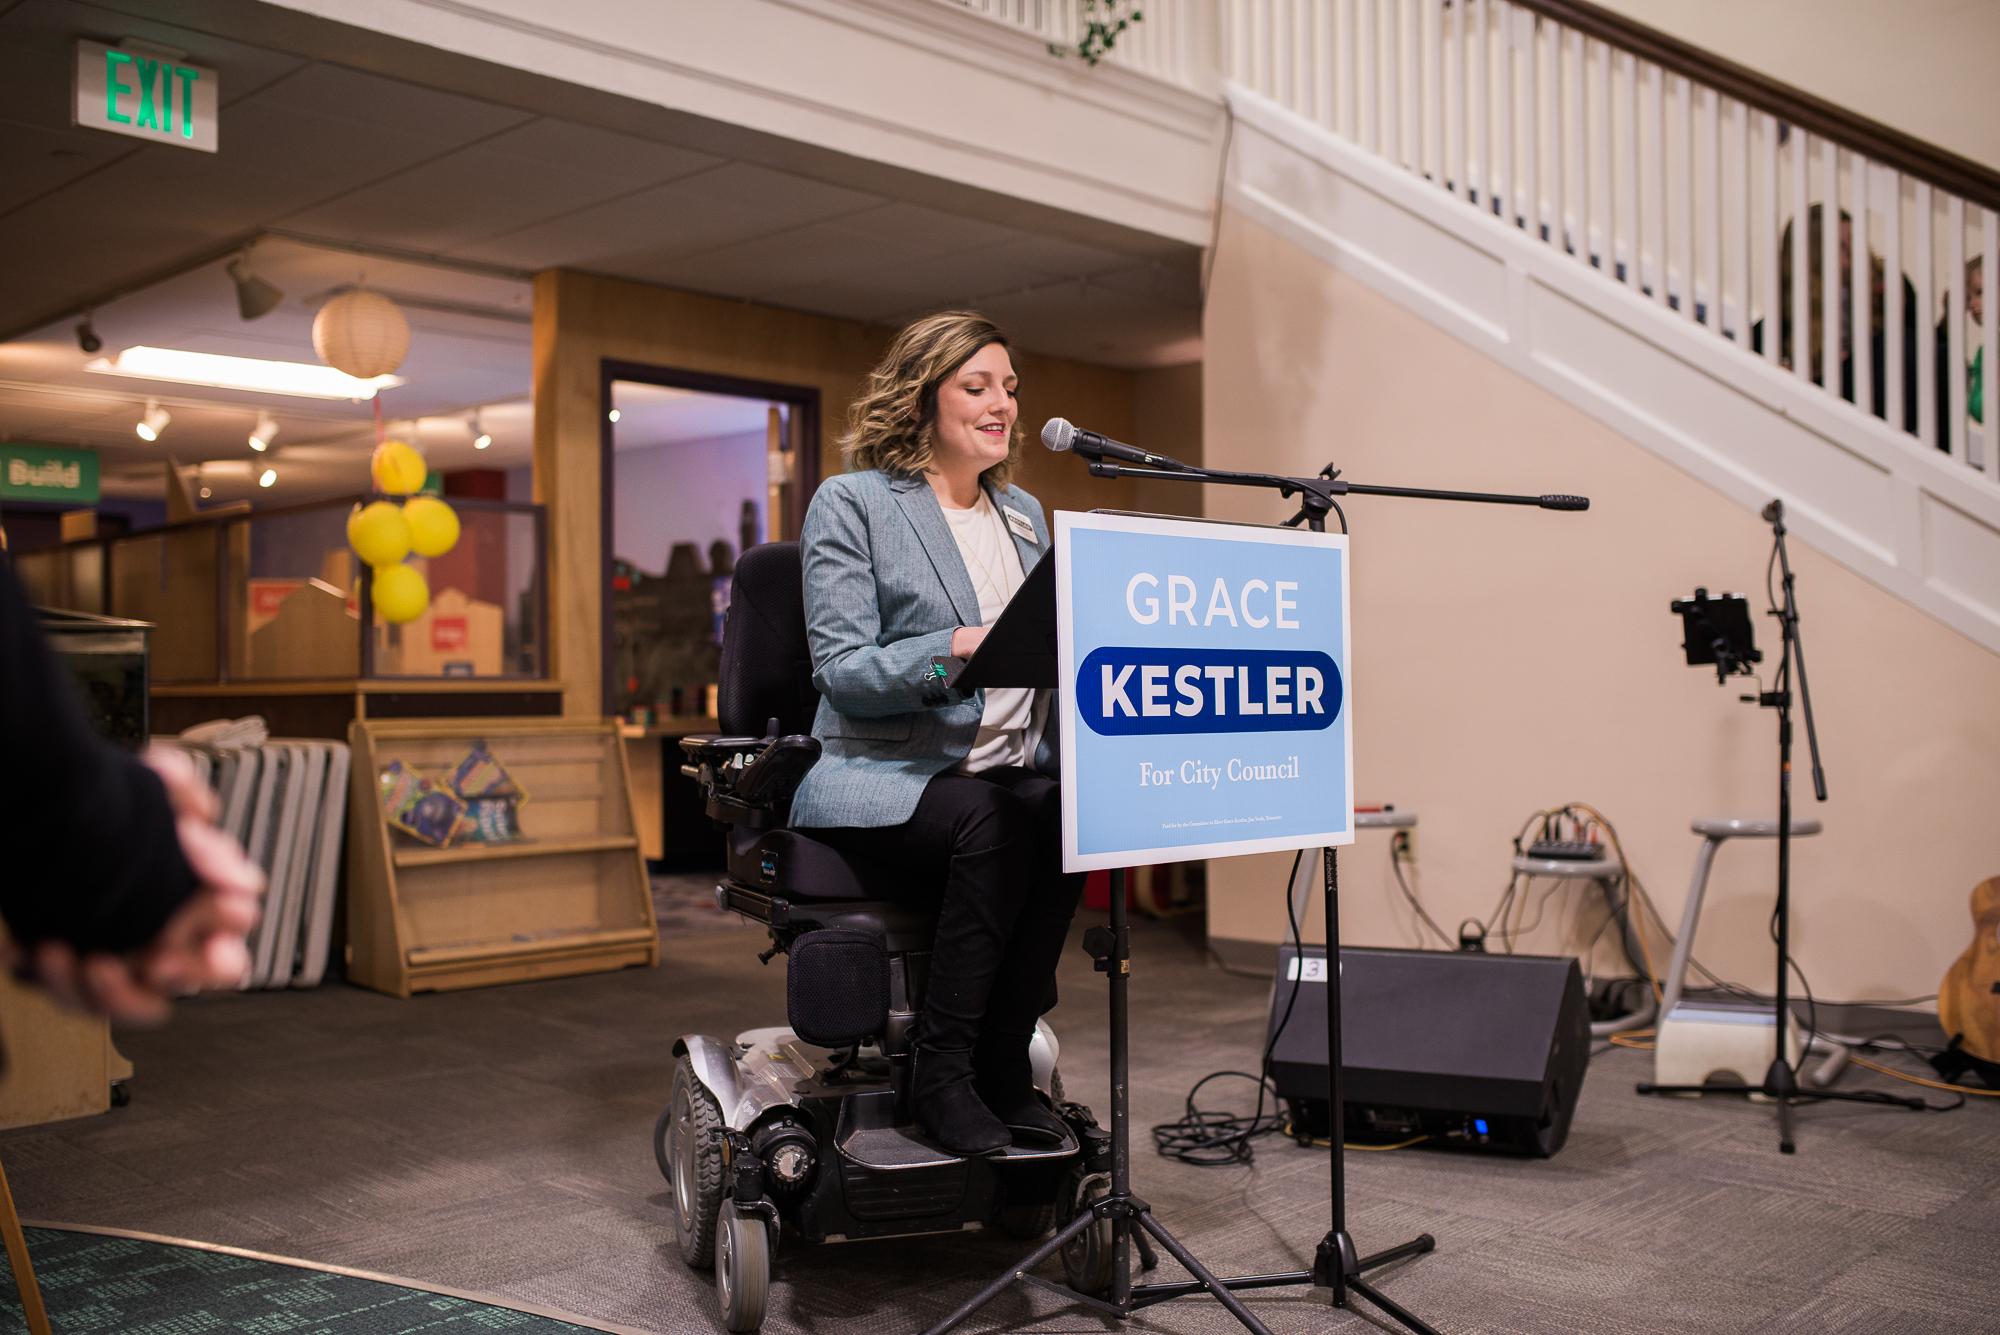 Elect Grace Kestler